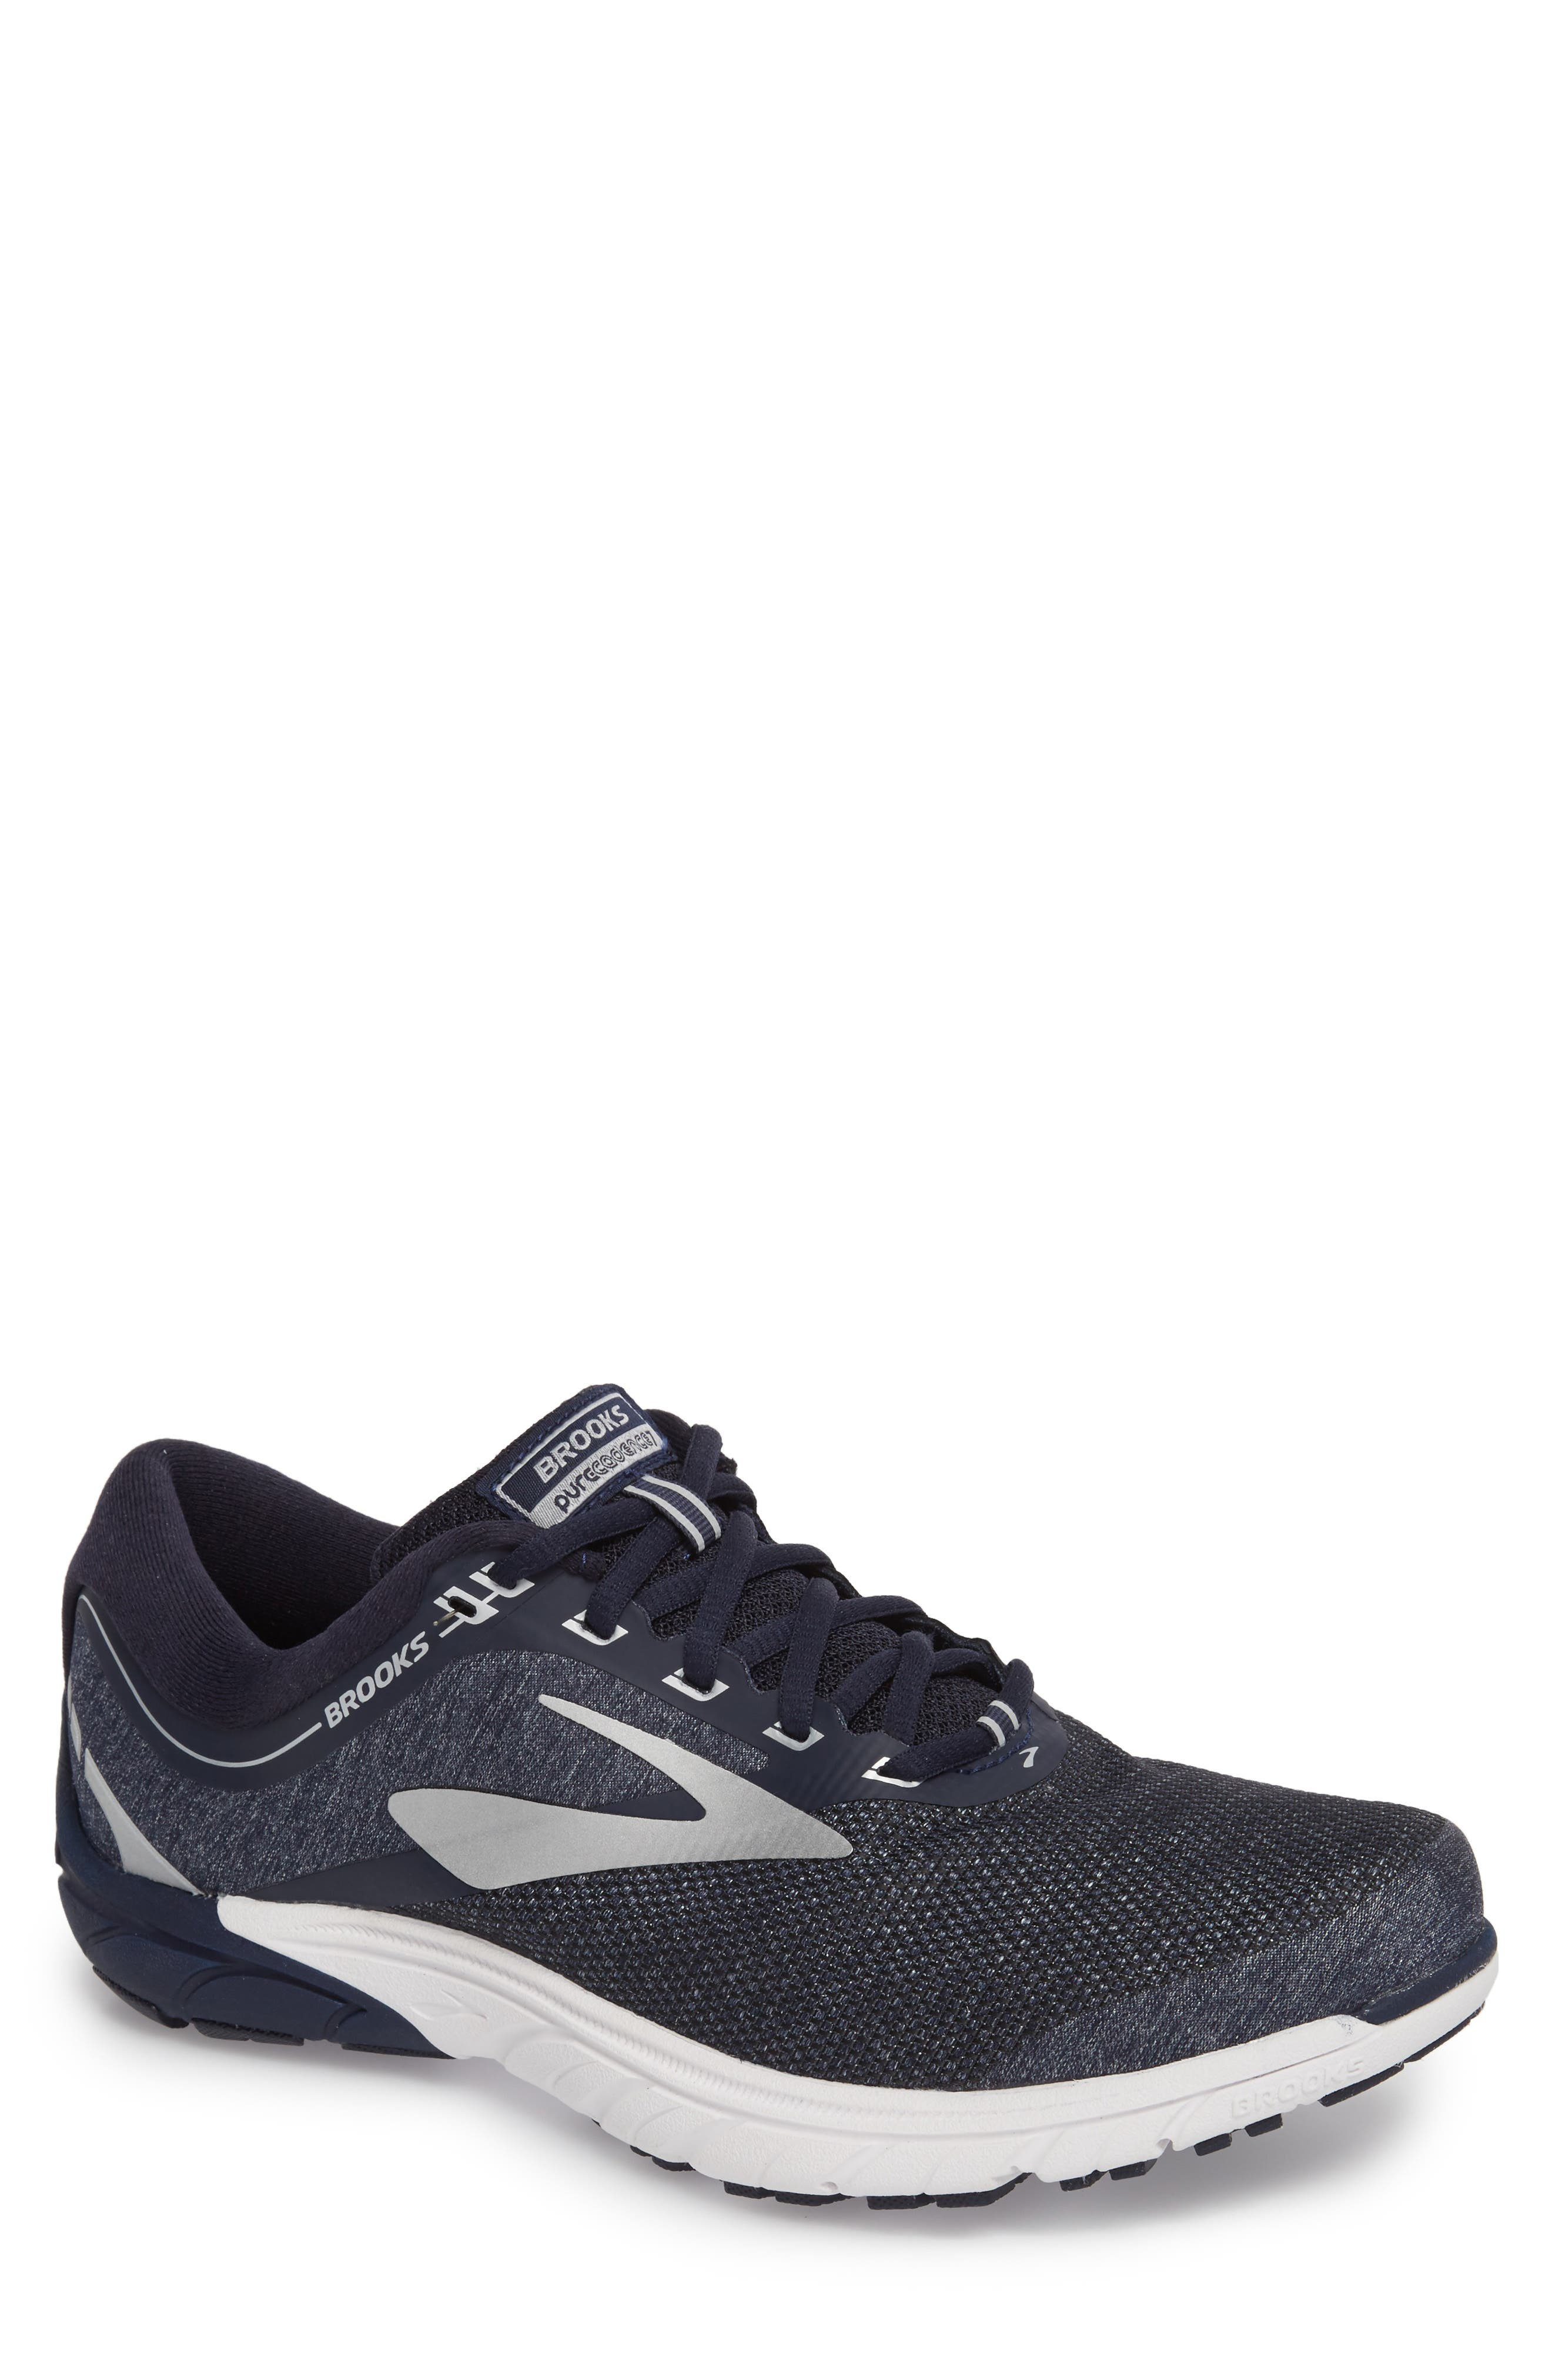 PureCadence 7 Road Running Shoe,                             Main thumbnail 1, color,                             Peacoat/ Silver/ White